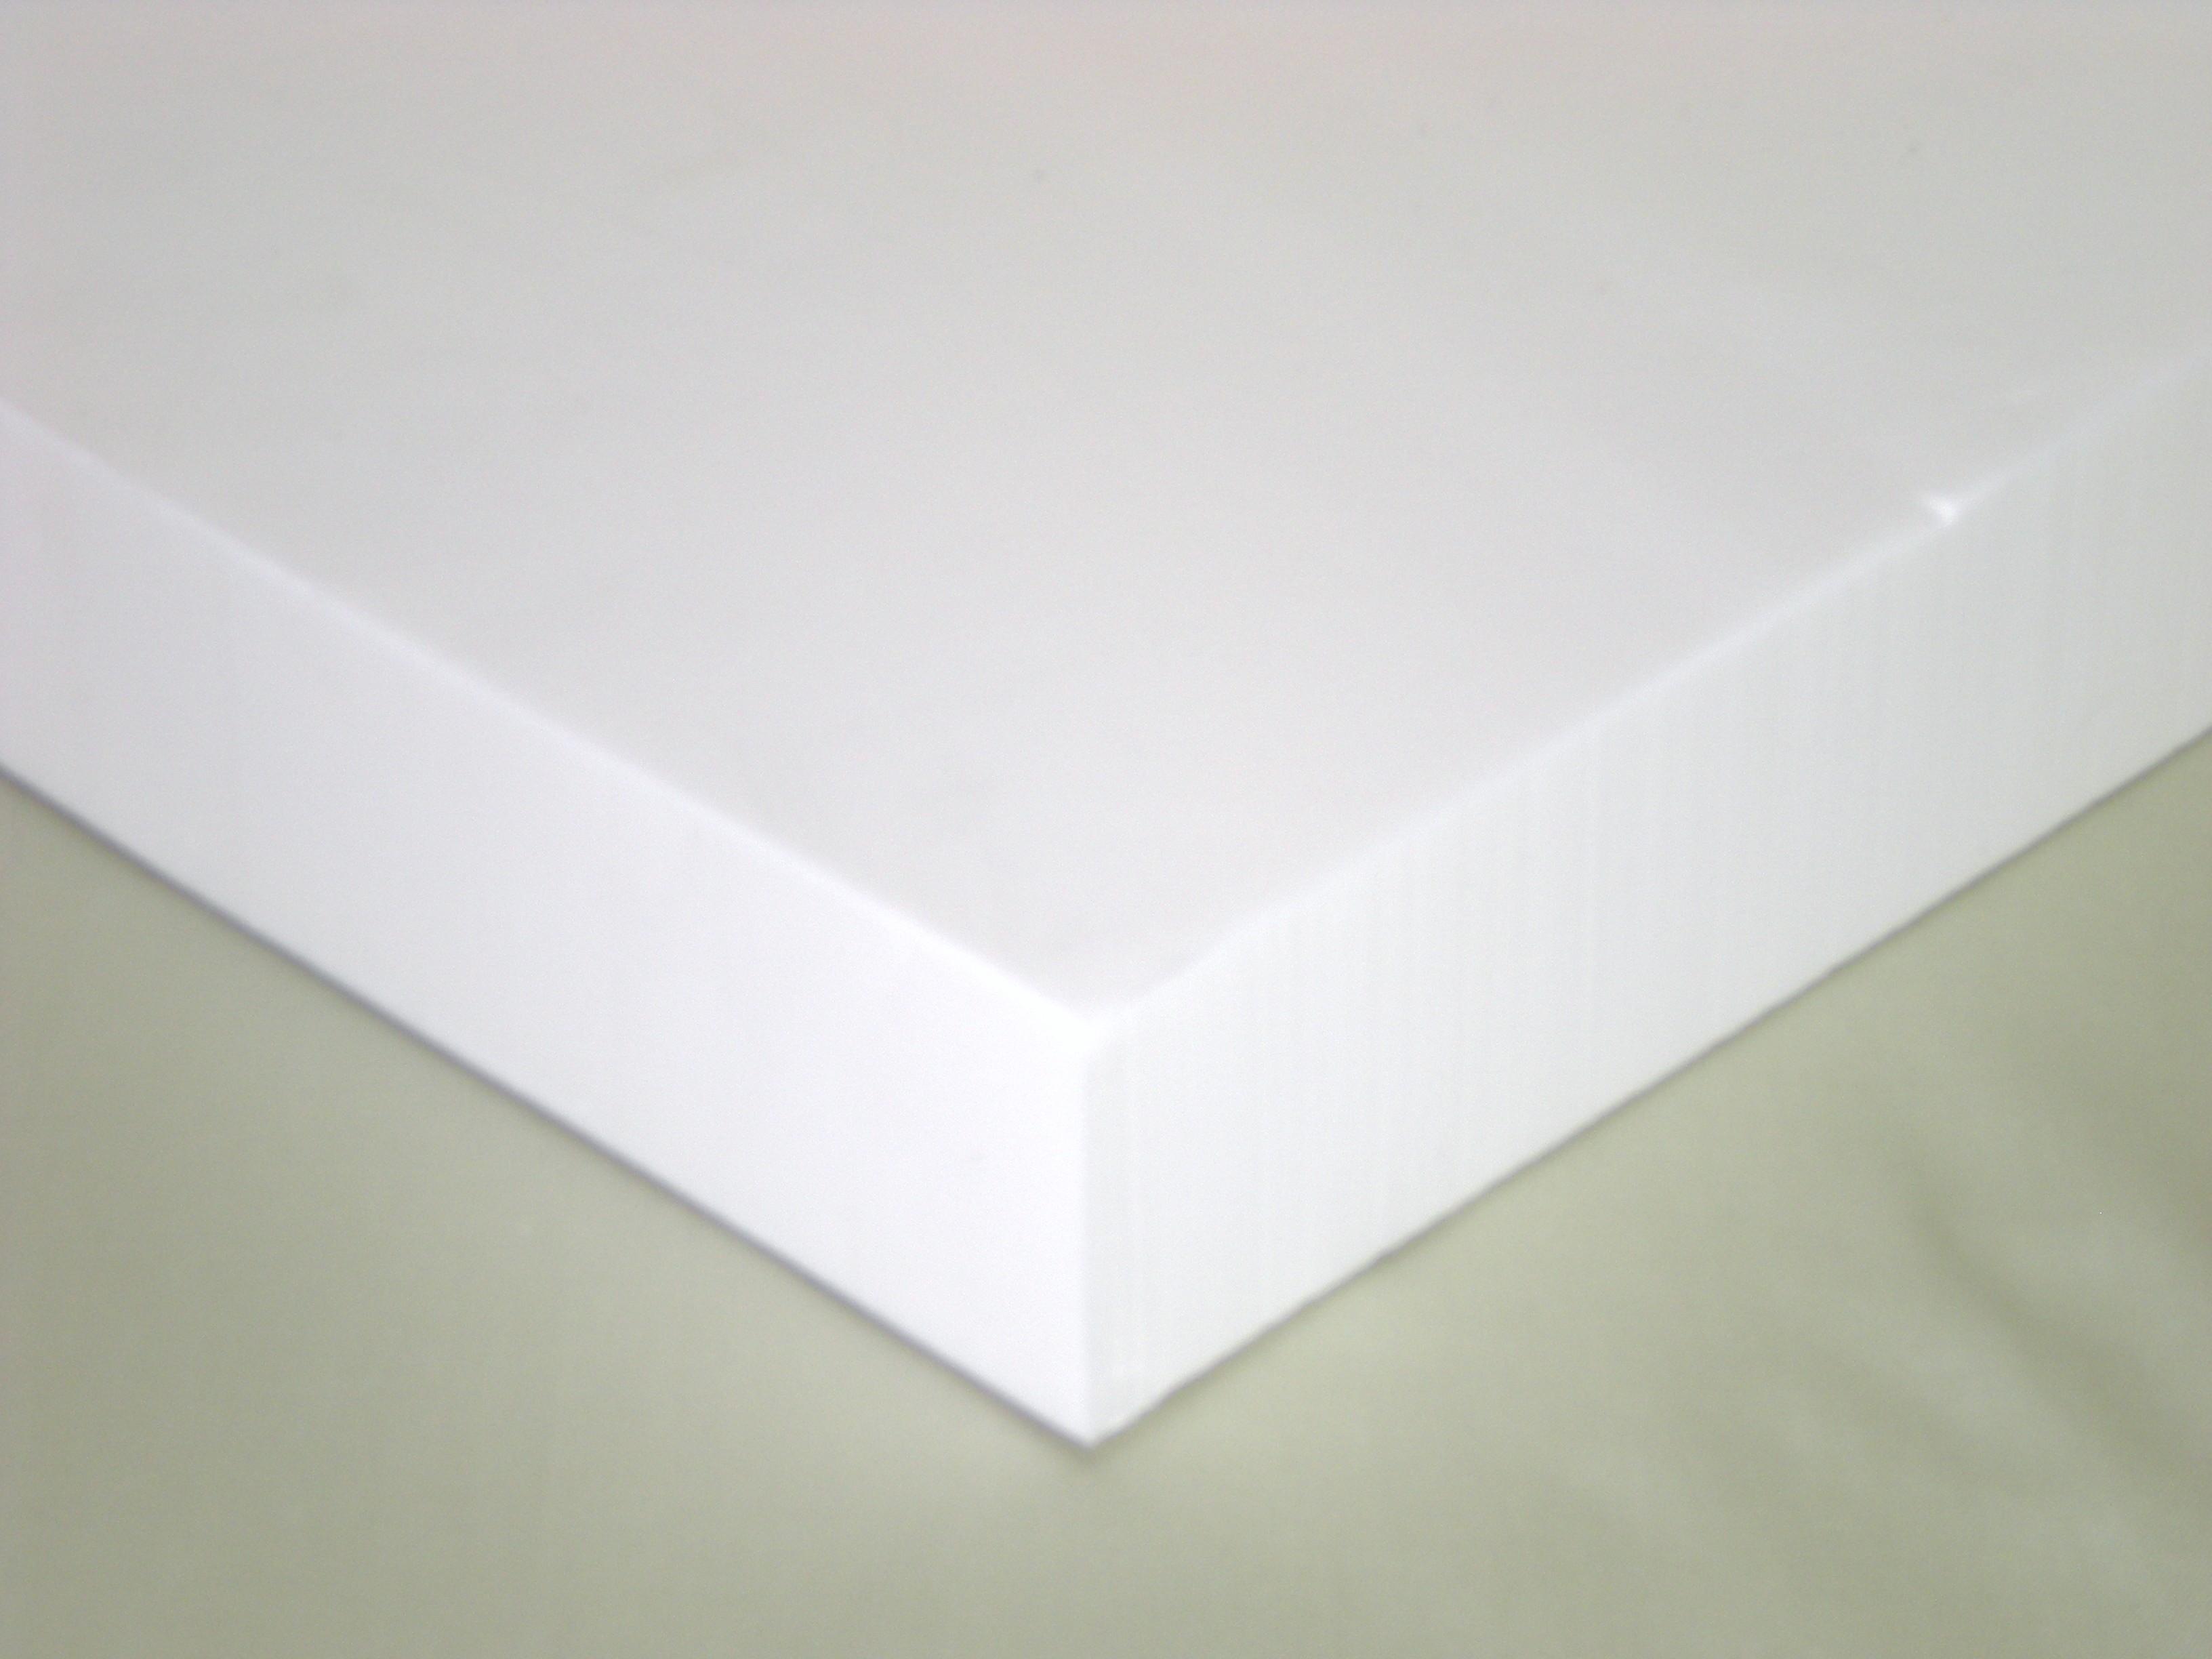 Comfort Foam Supplies---Foam Supplier, Custom Foam, Foam Matttress